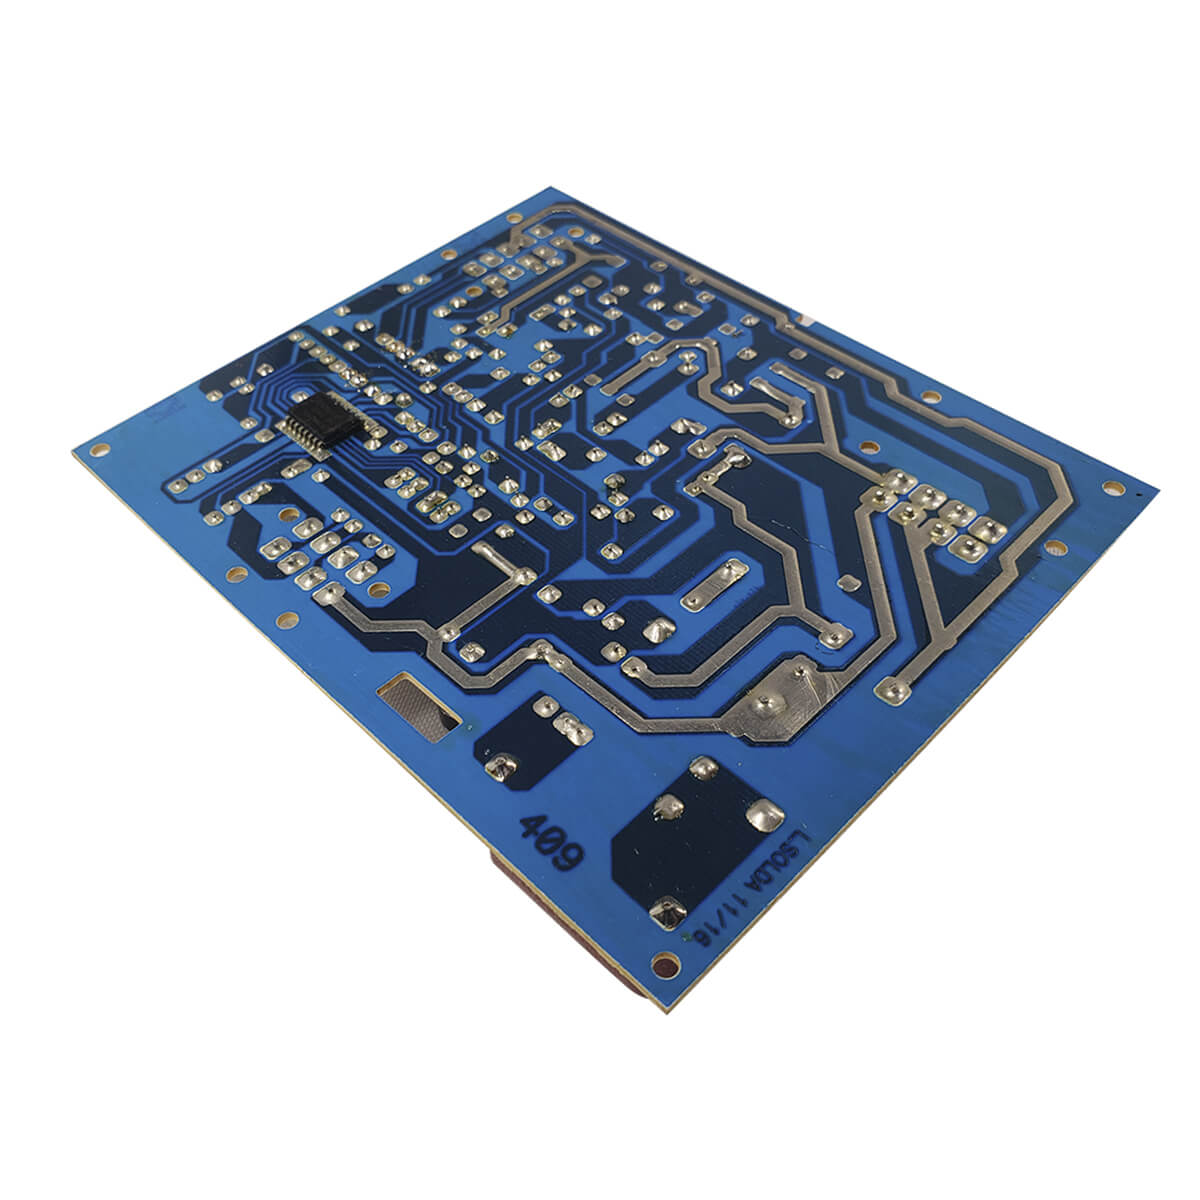 Controle Eletrônico Para Refrigerador Brastemp BRM44 BRM47 BRM48 BRM49 Alado - W10314660 3260633223